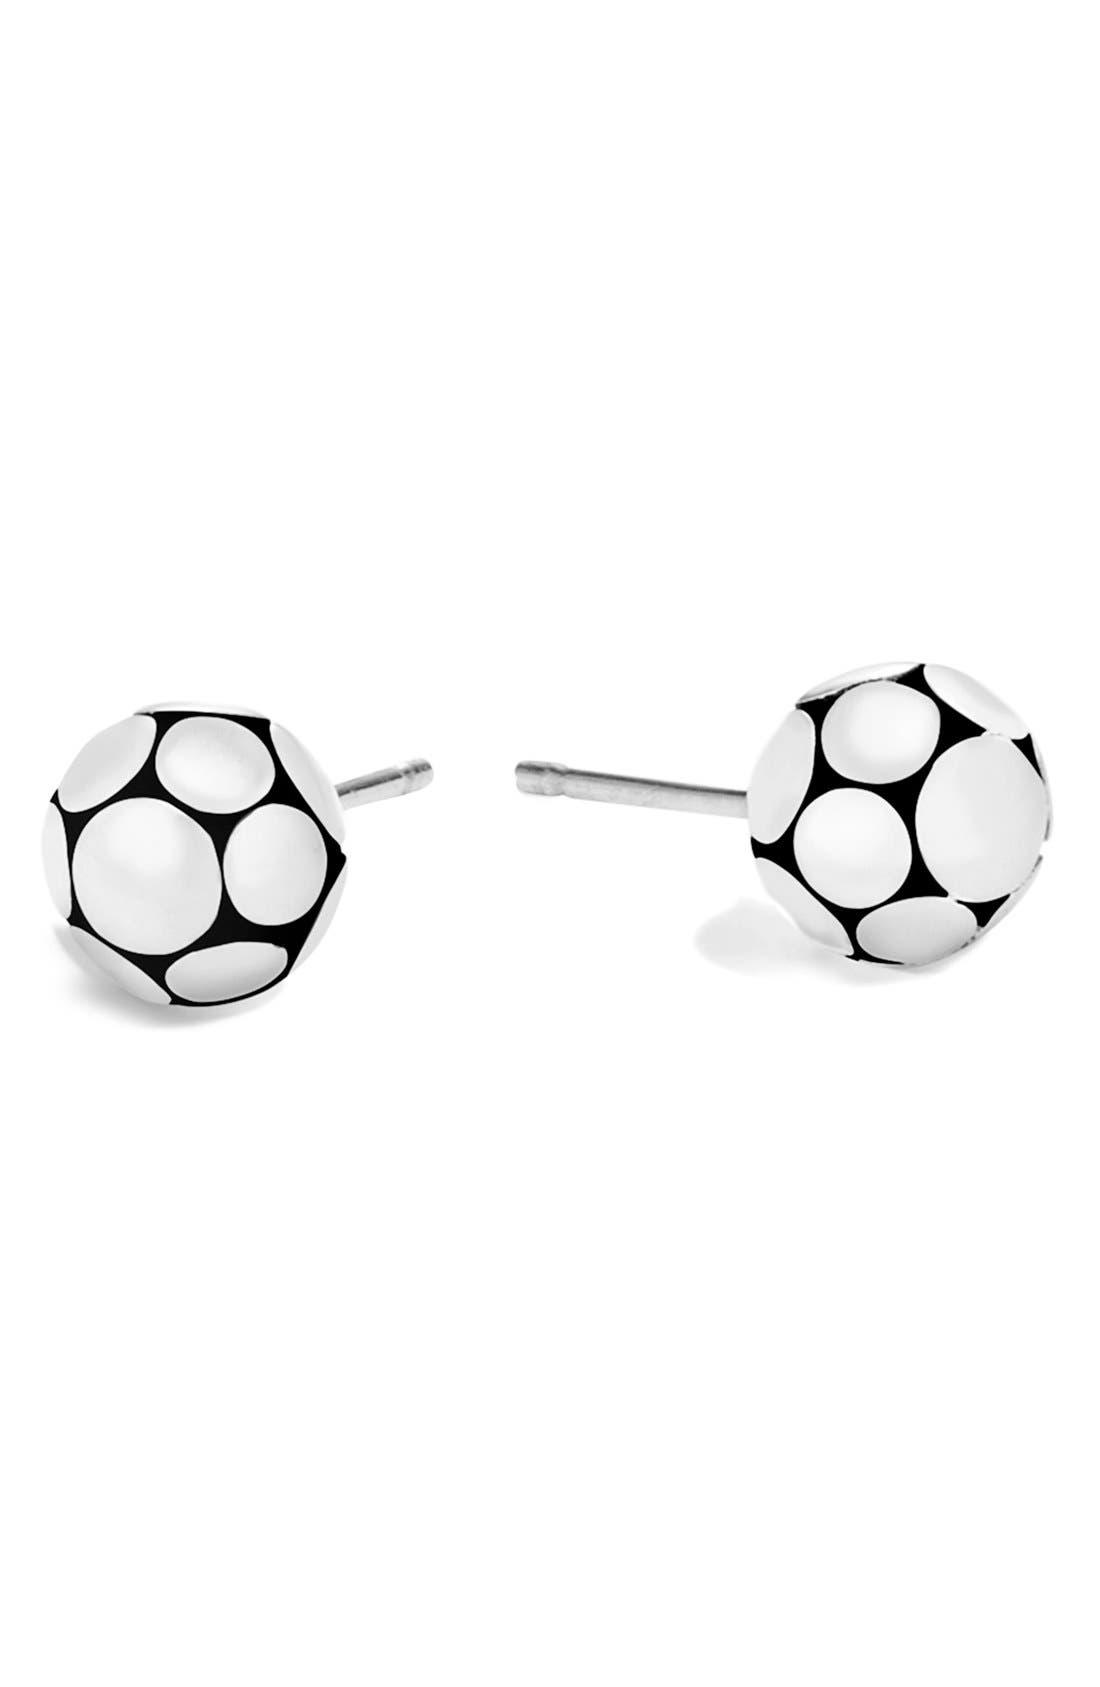 John Hardy Dot Small Stud Earrings